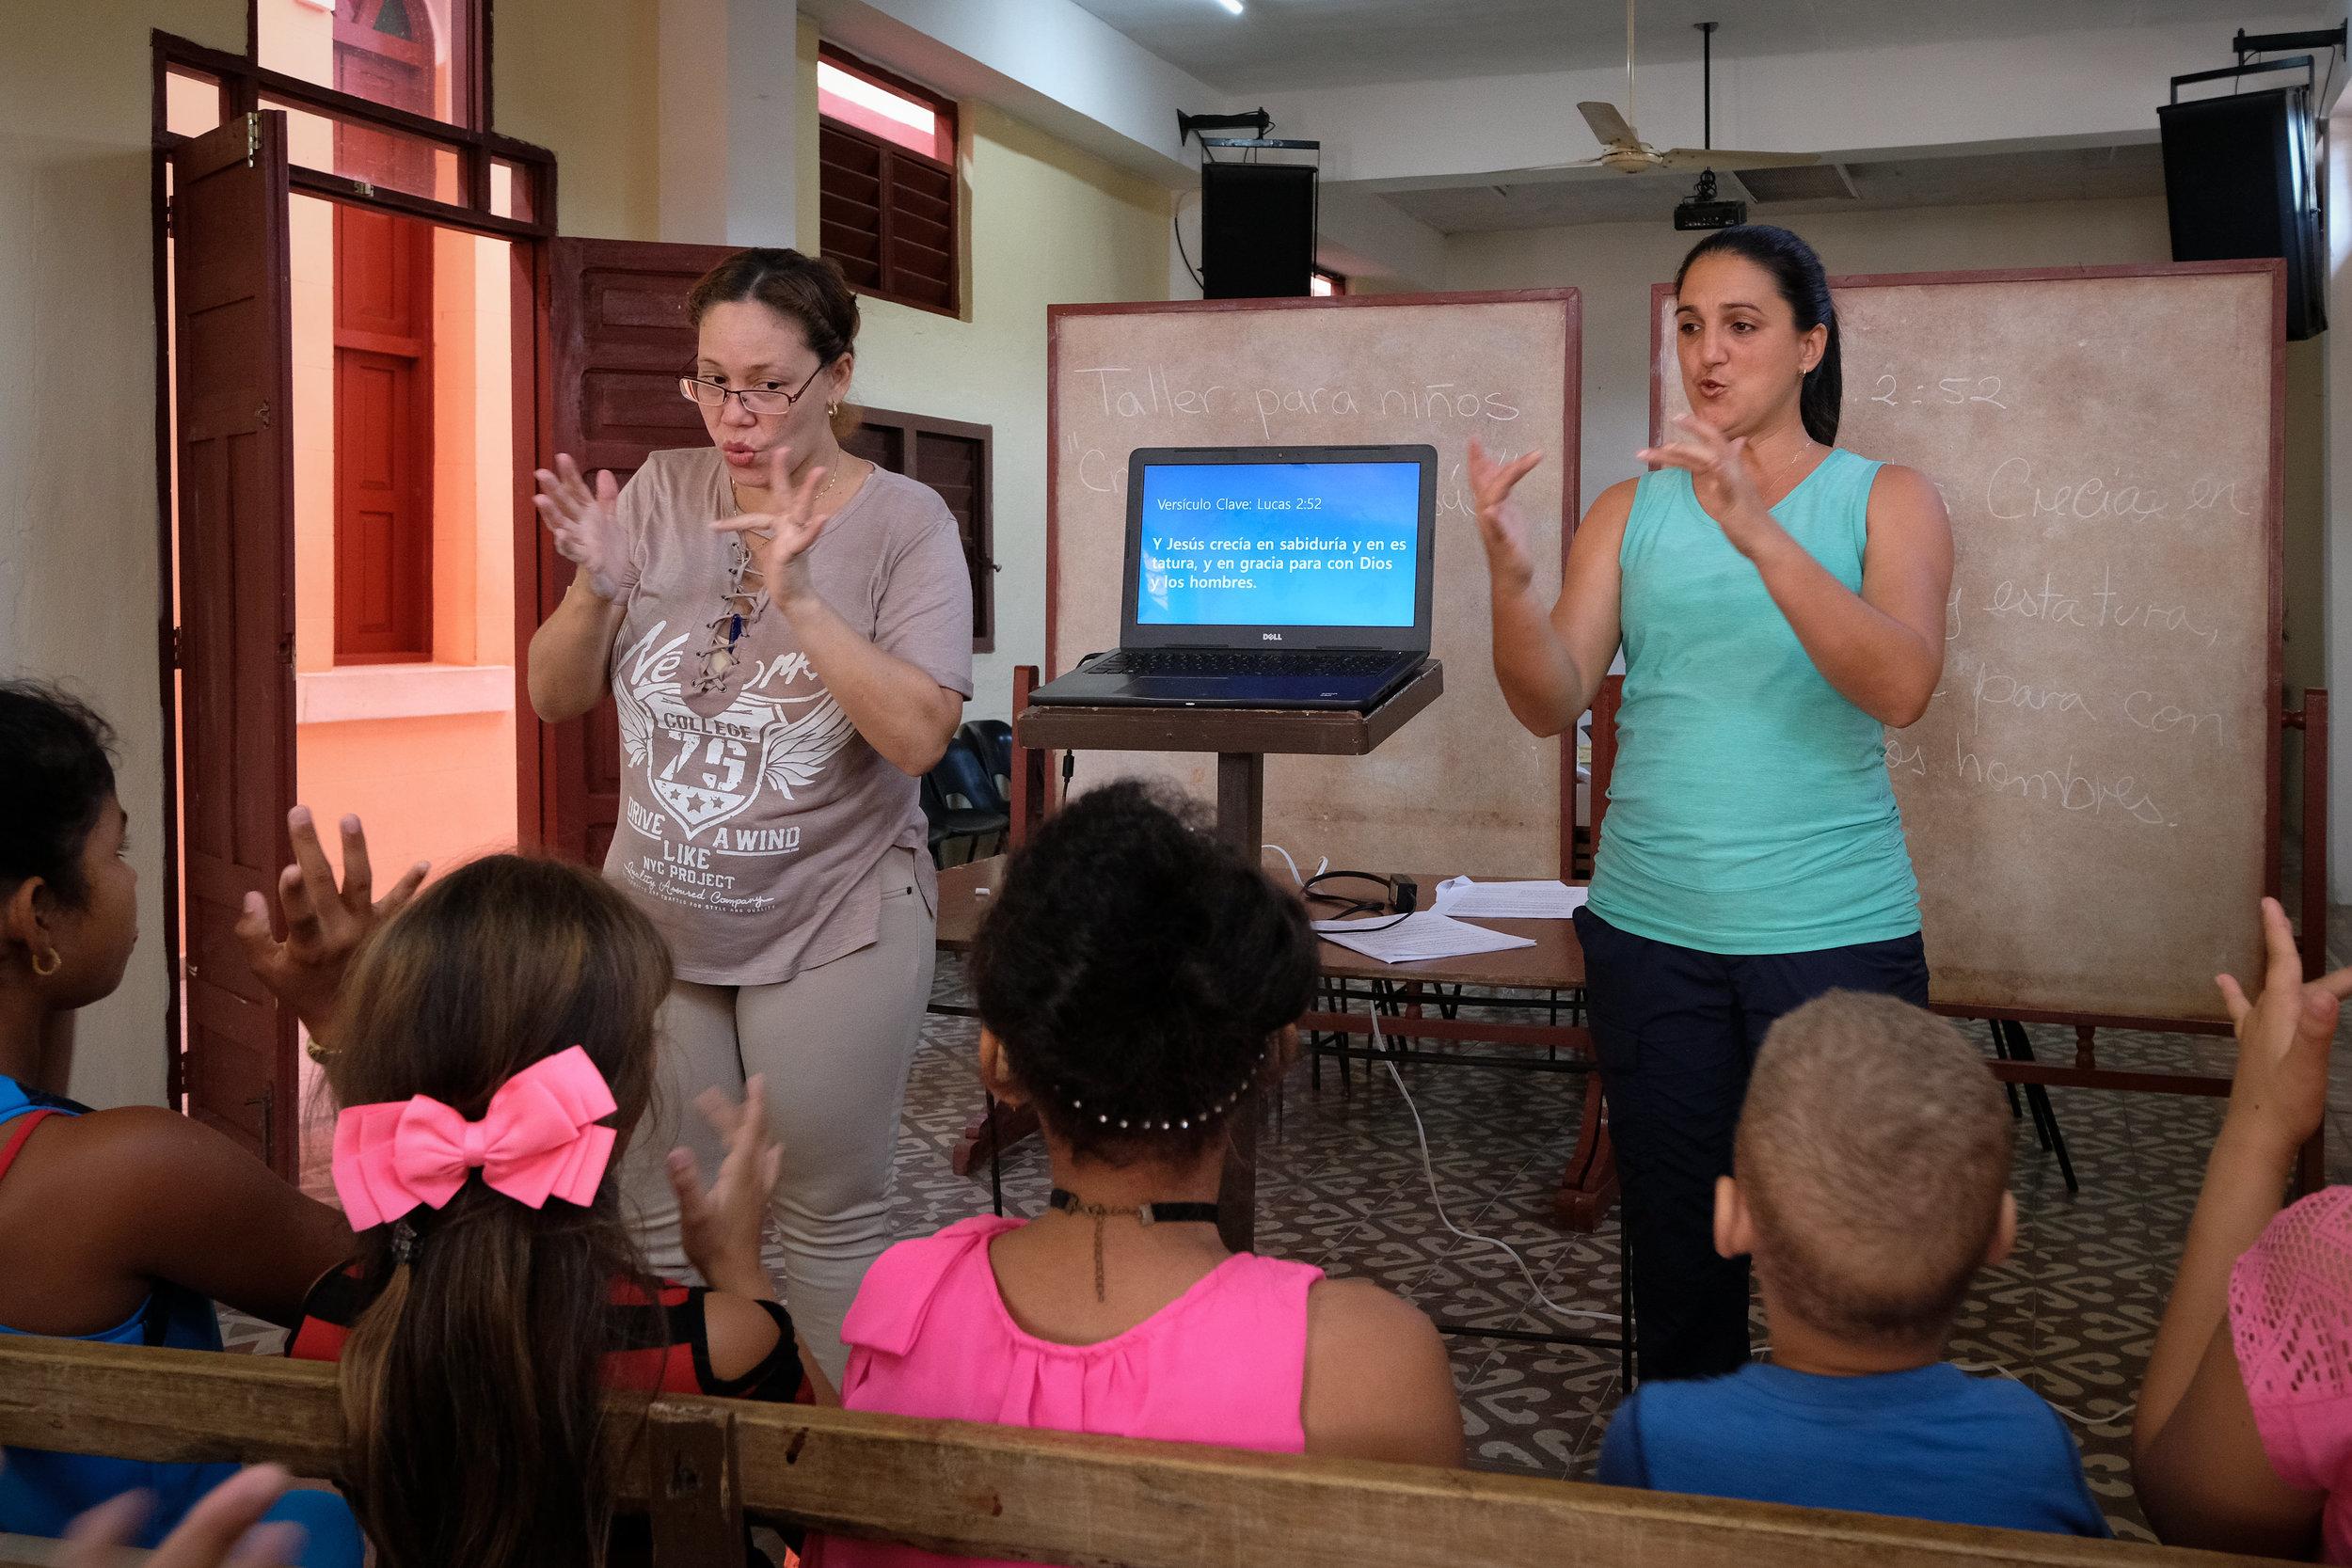 Ayler & Kaita teach a Bible Verse to memorize